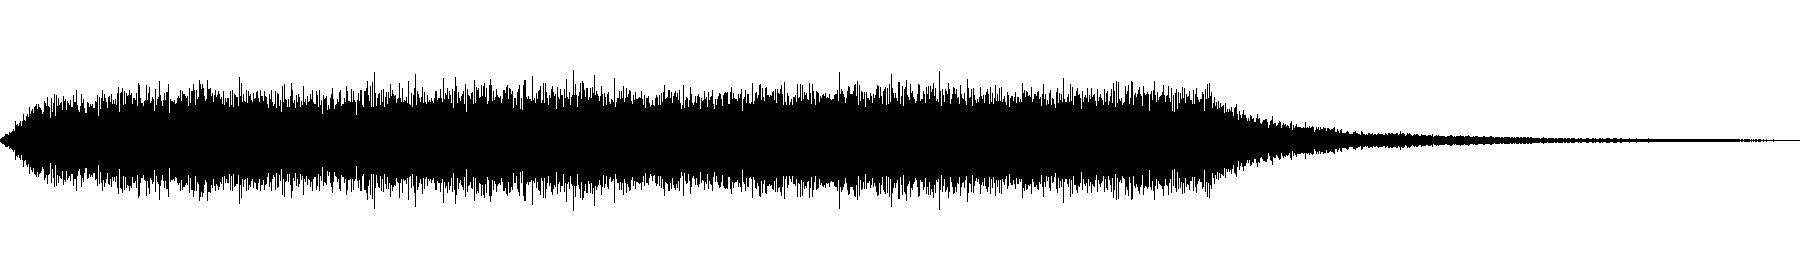 organ f7